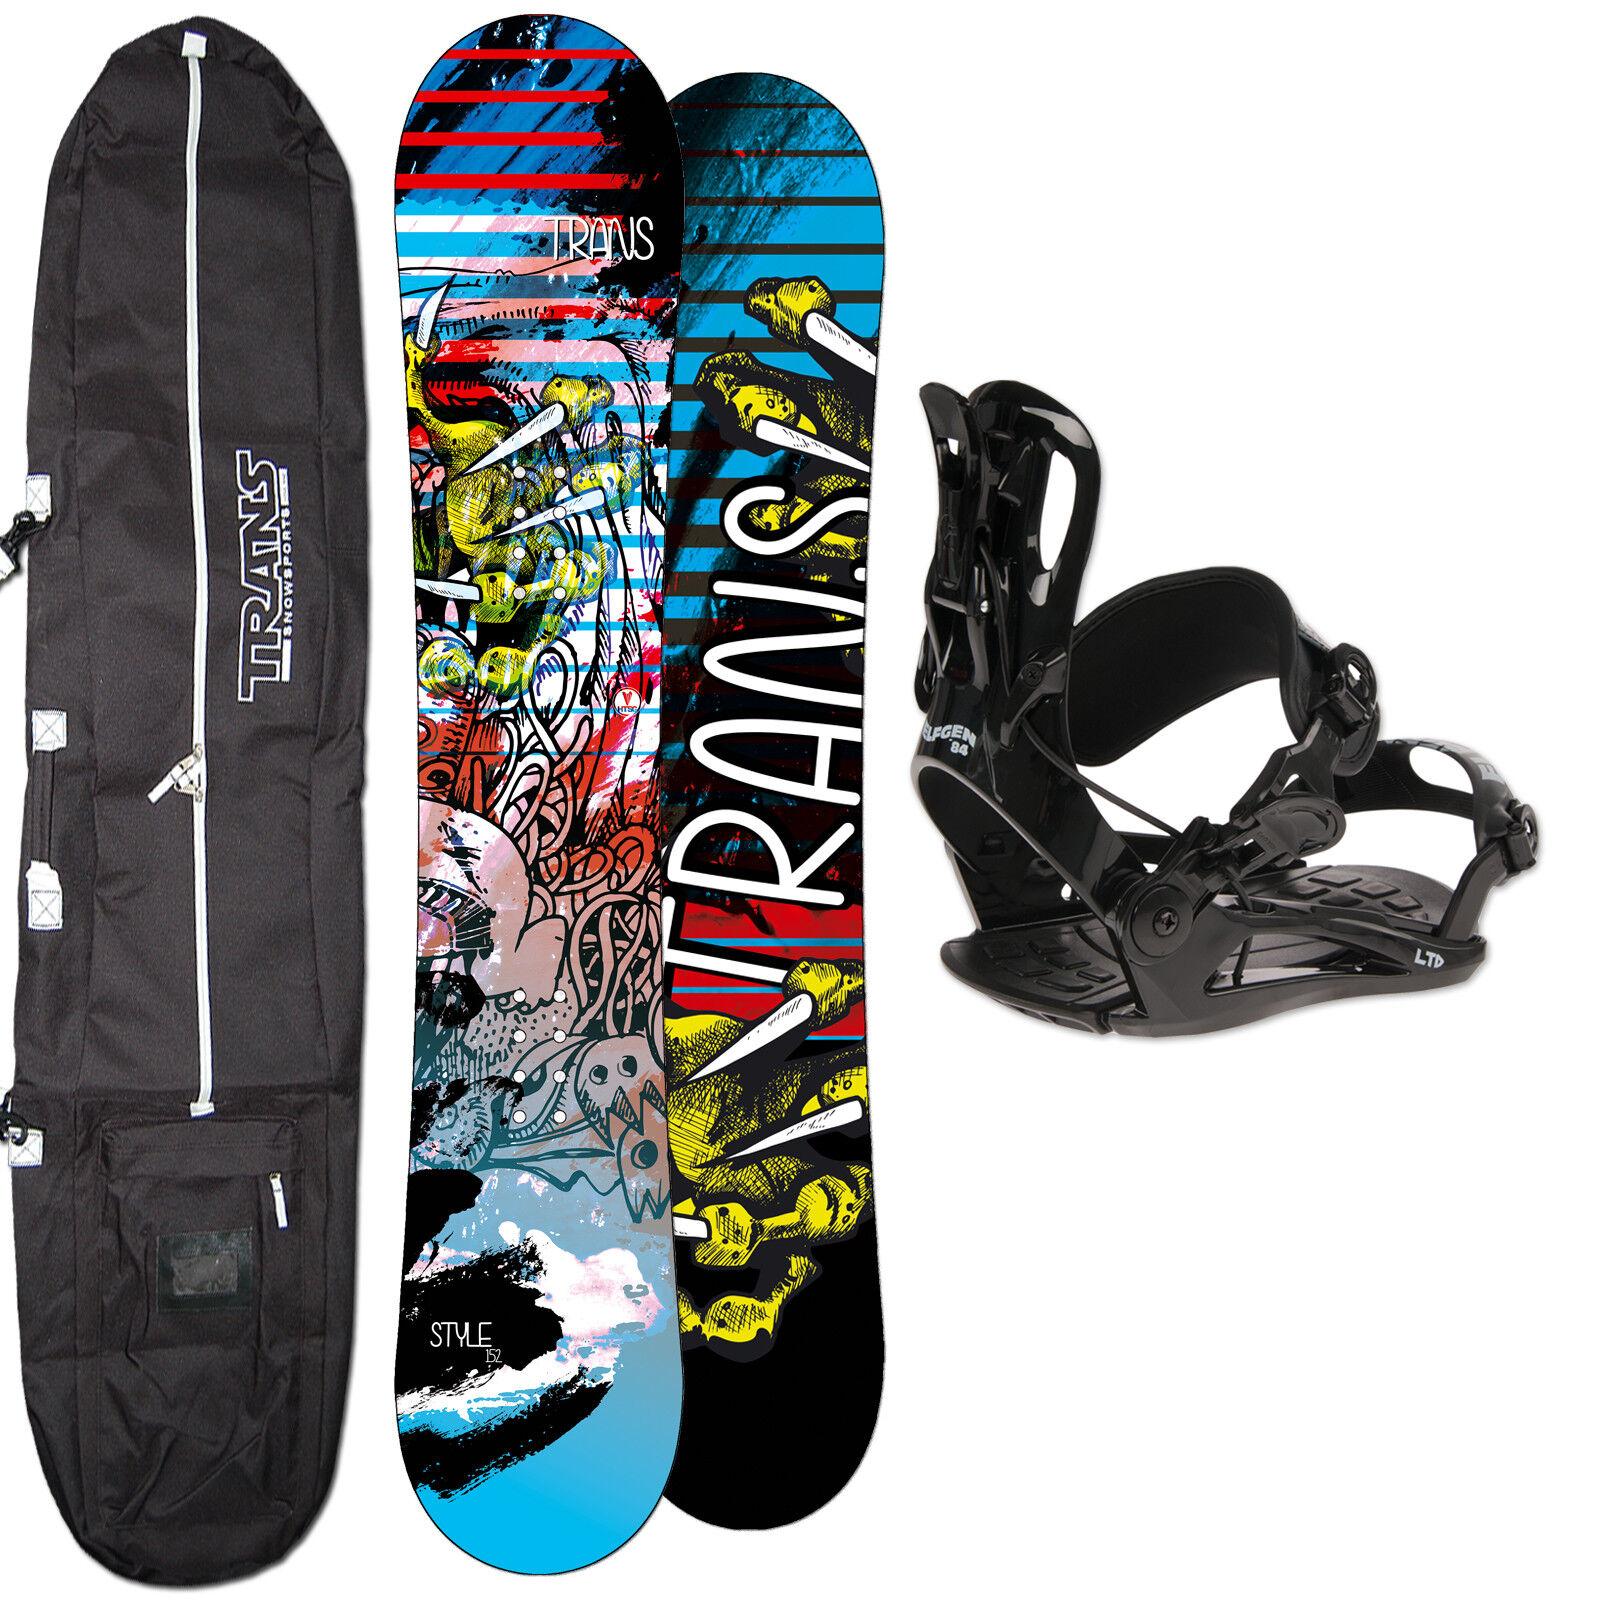 Hombres Snowboard Trans Style 146 cm + Fastec Fijación TALLA M + Bolsa